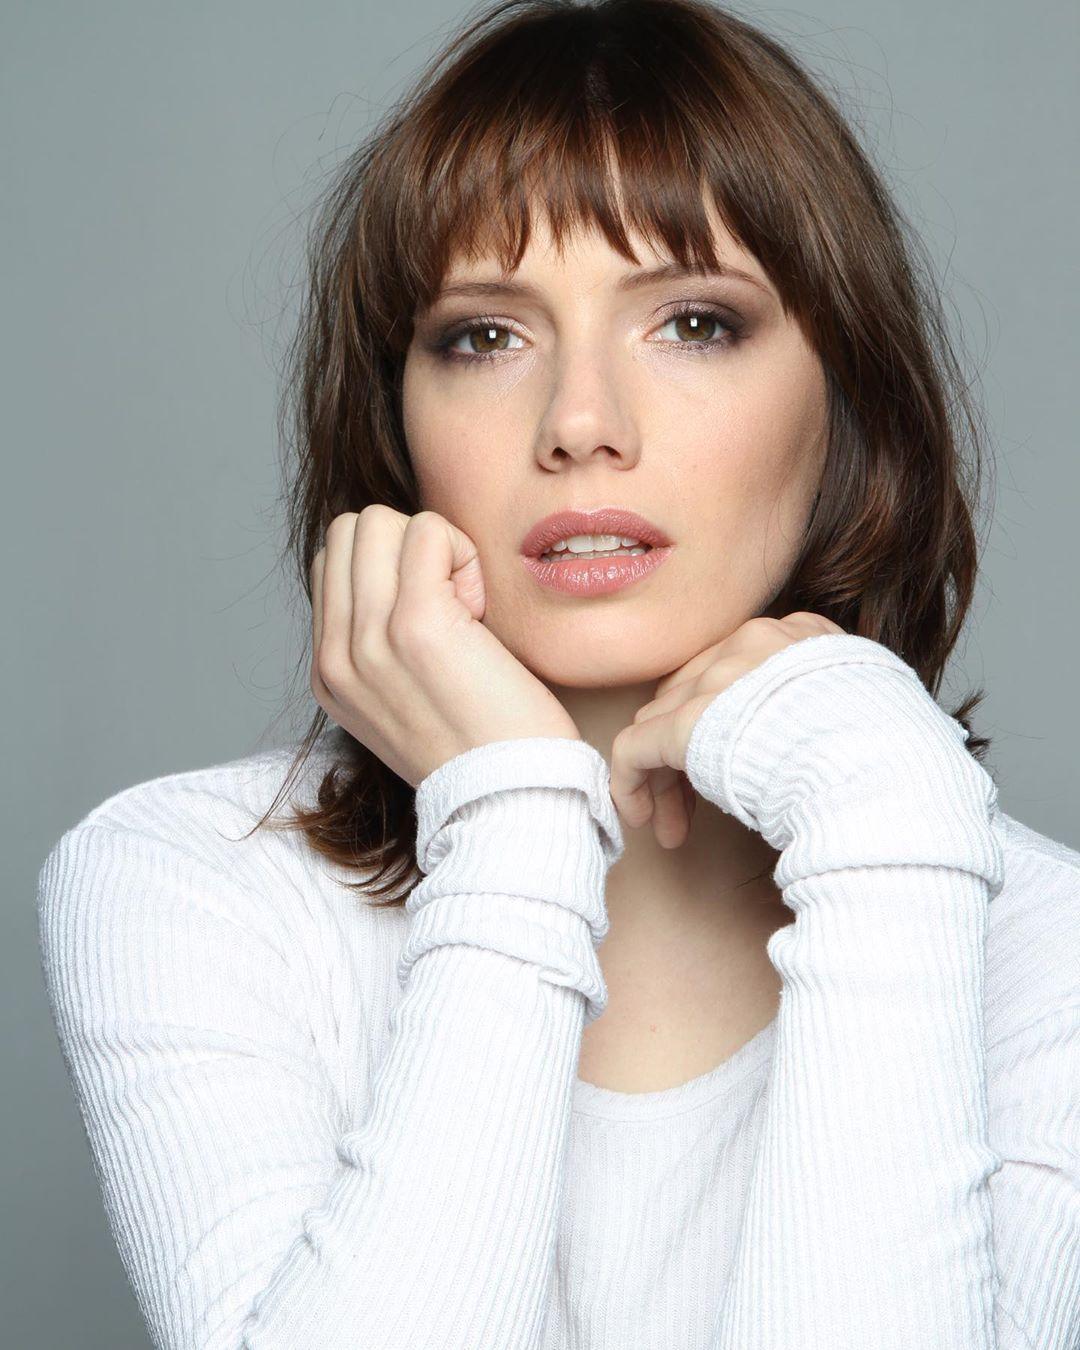 Diana Gomez estatura Valeria Netflix reparto